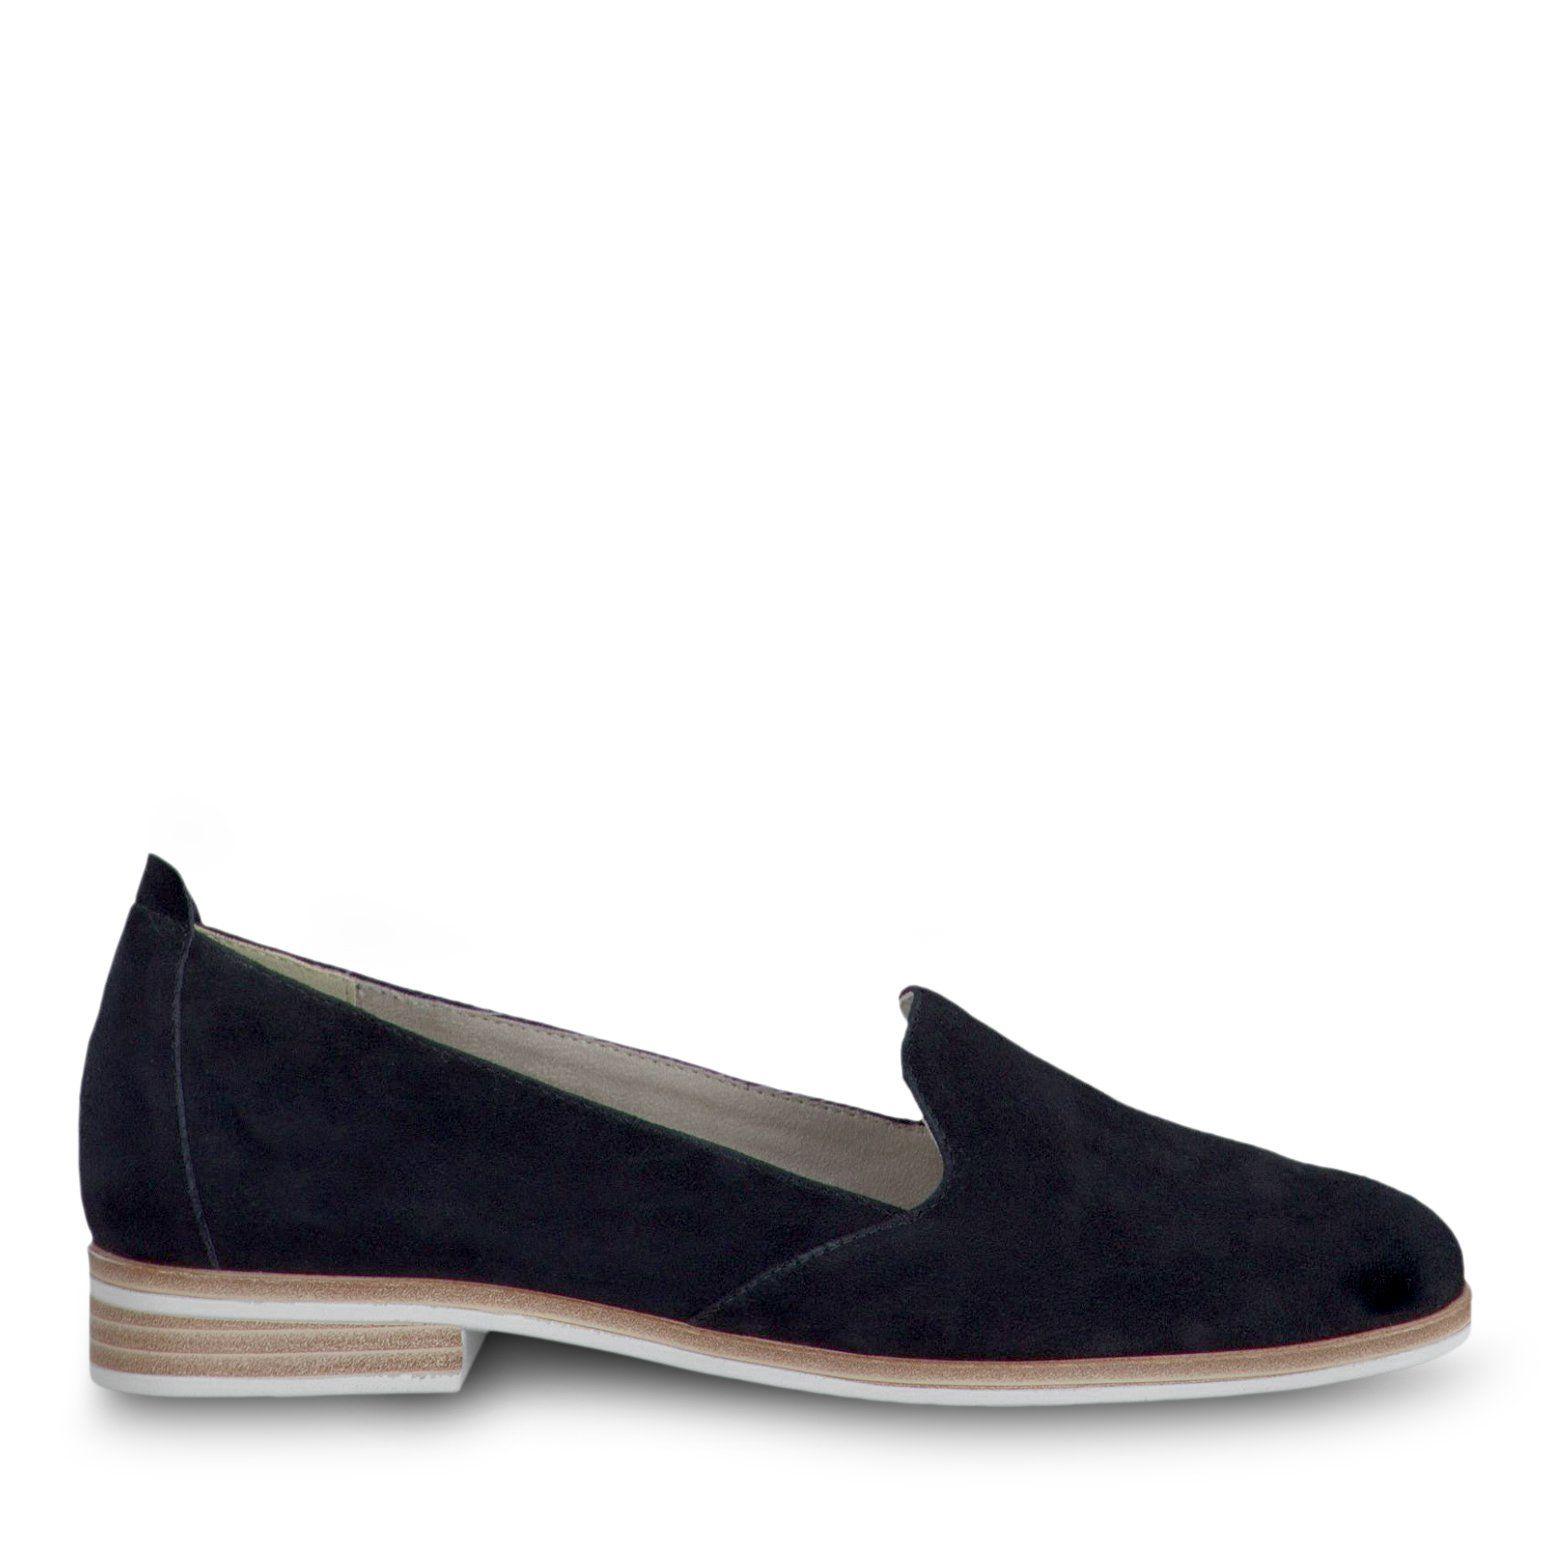 Pistil 1 1 24208 28 Kup Tamaris Wsuwane Przez Internet Tamaris Shoes Loafers